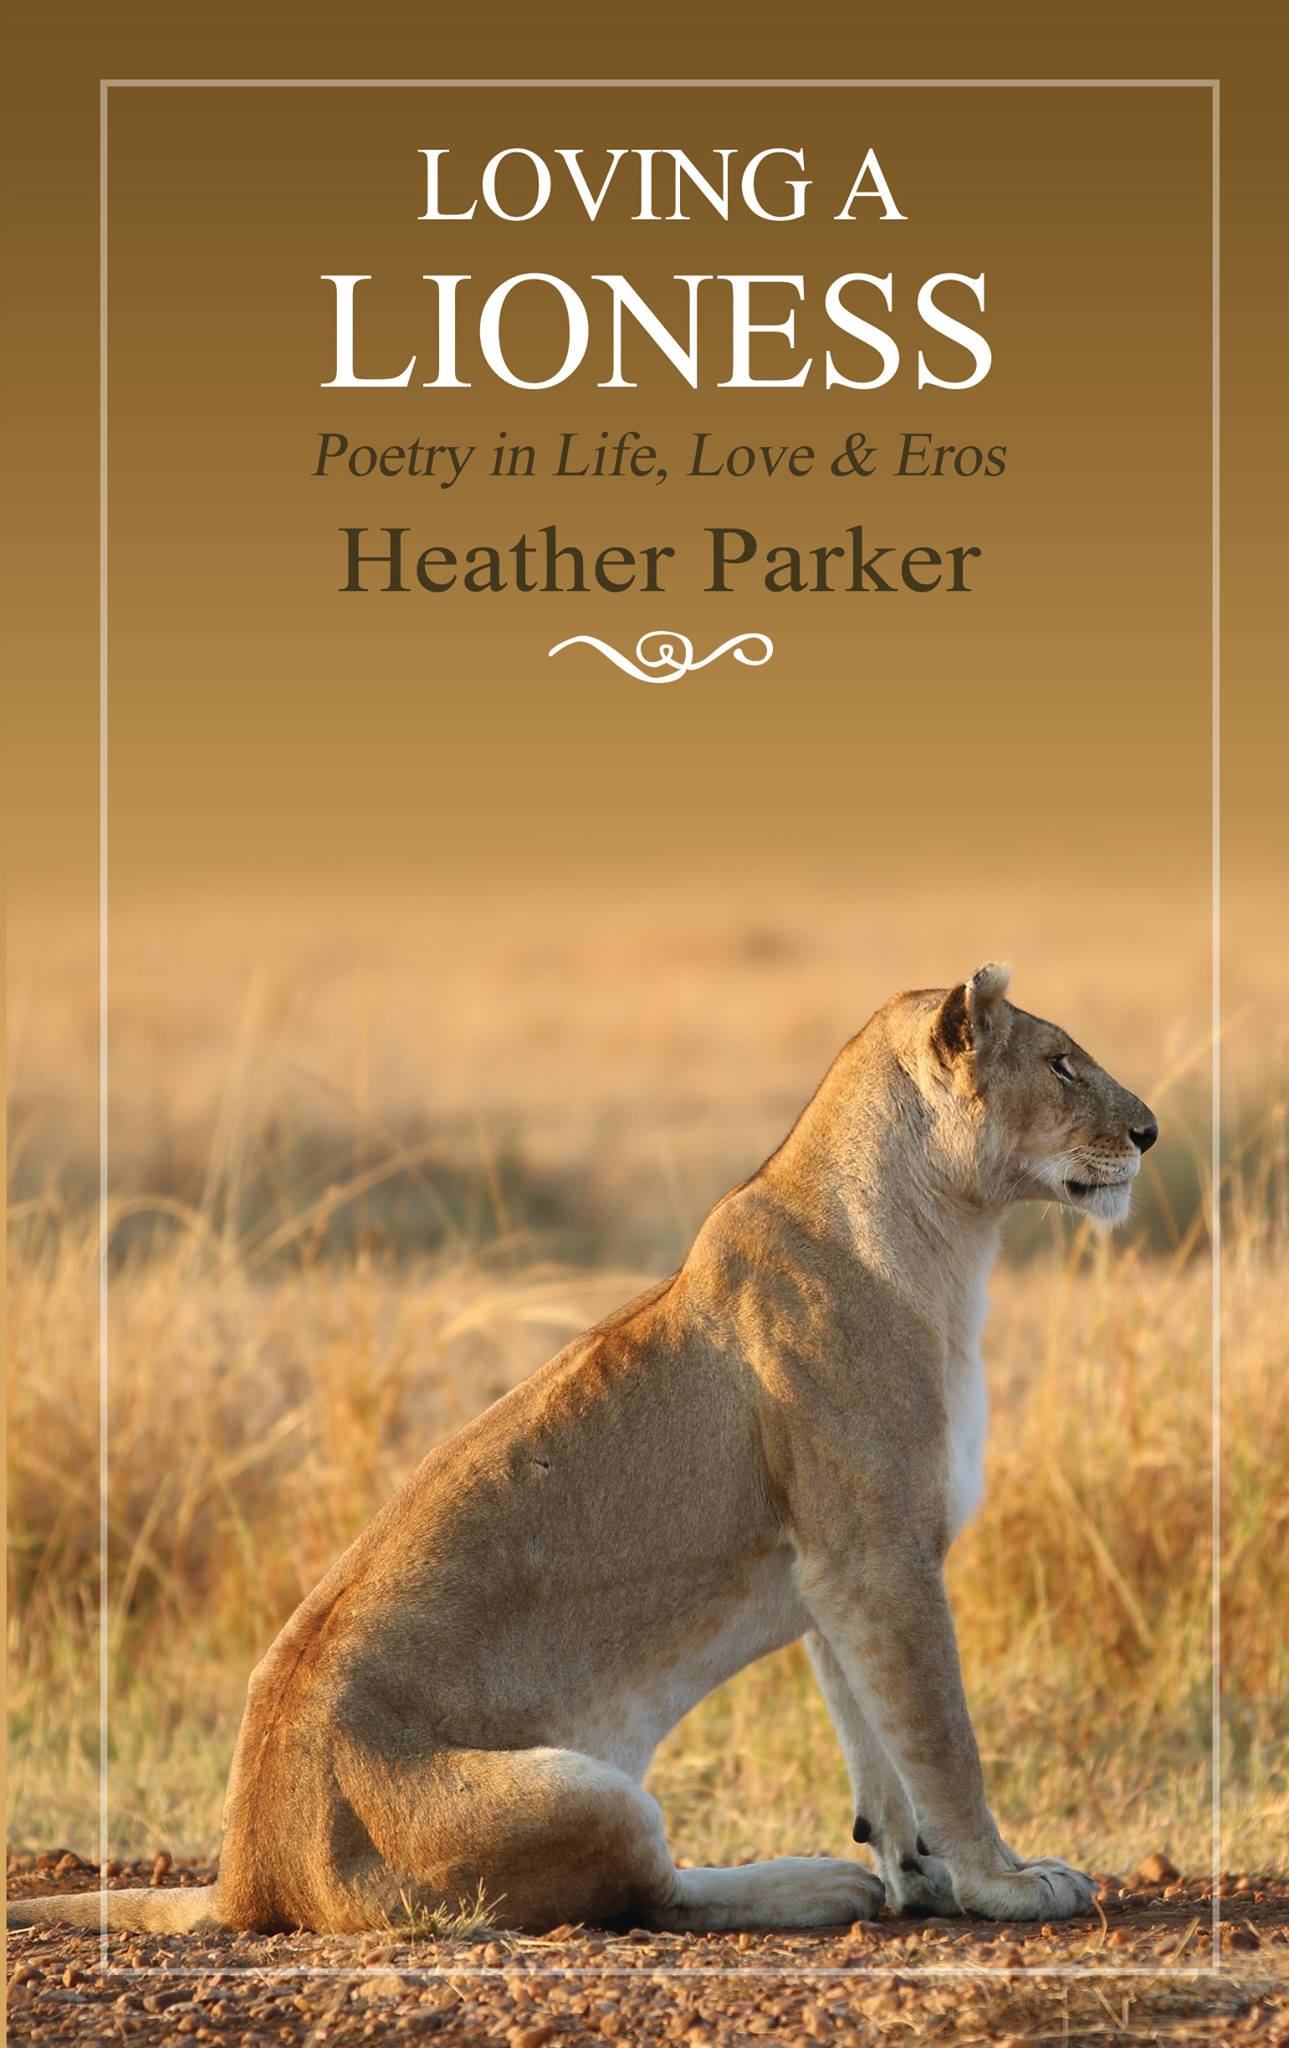 Loving a Lioness Heather Parker | World Stage Press